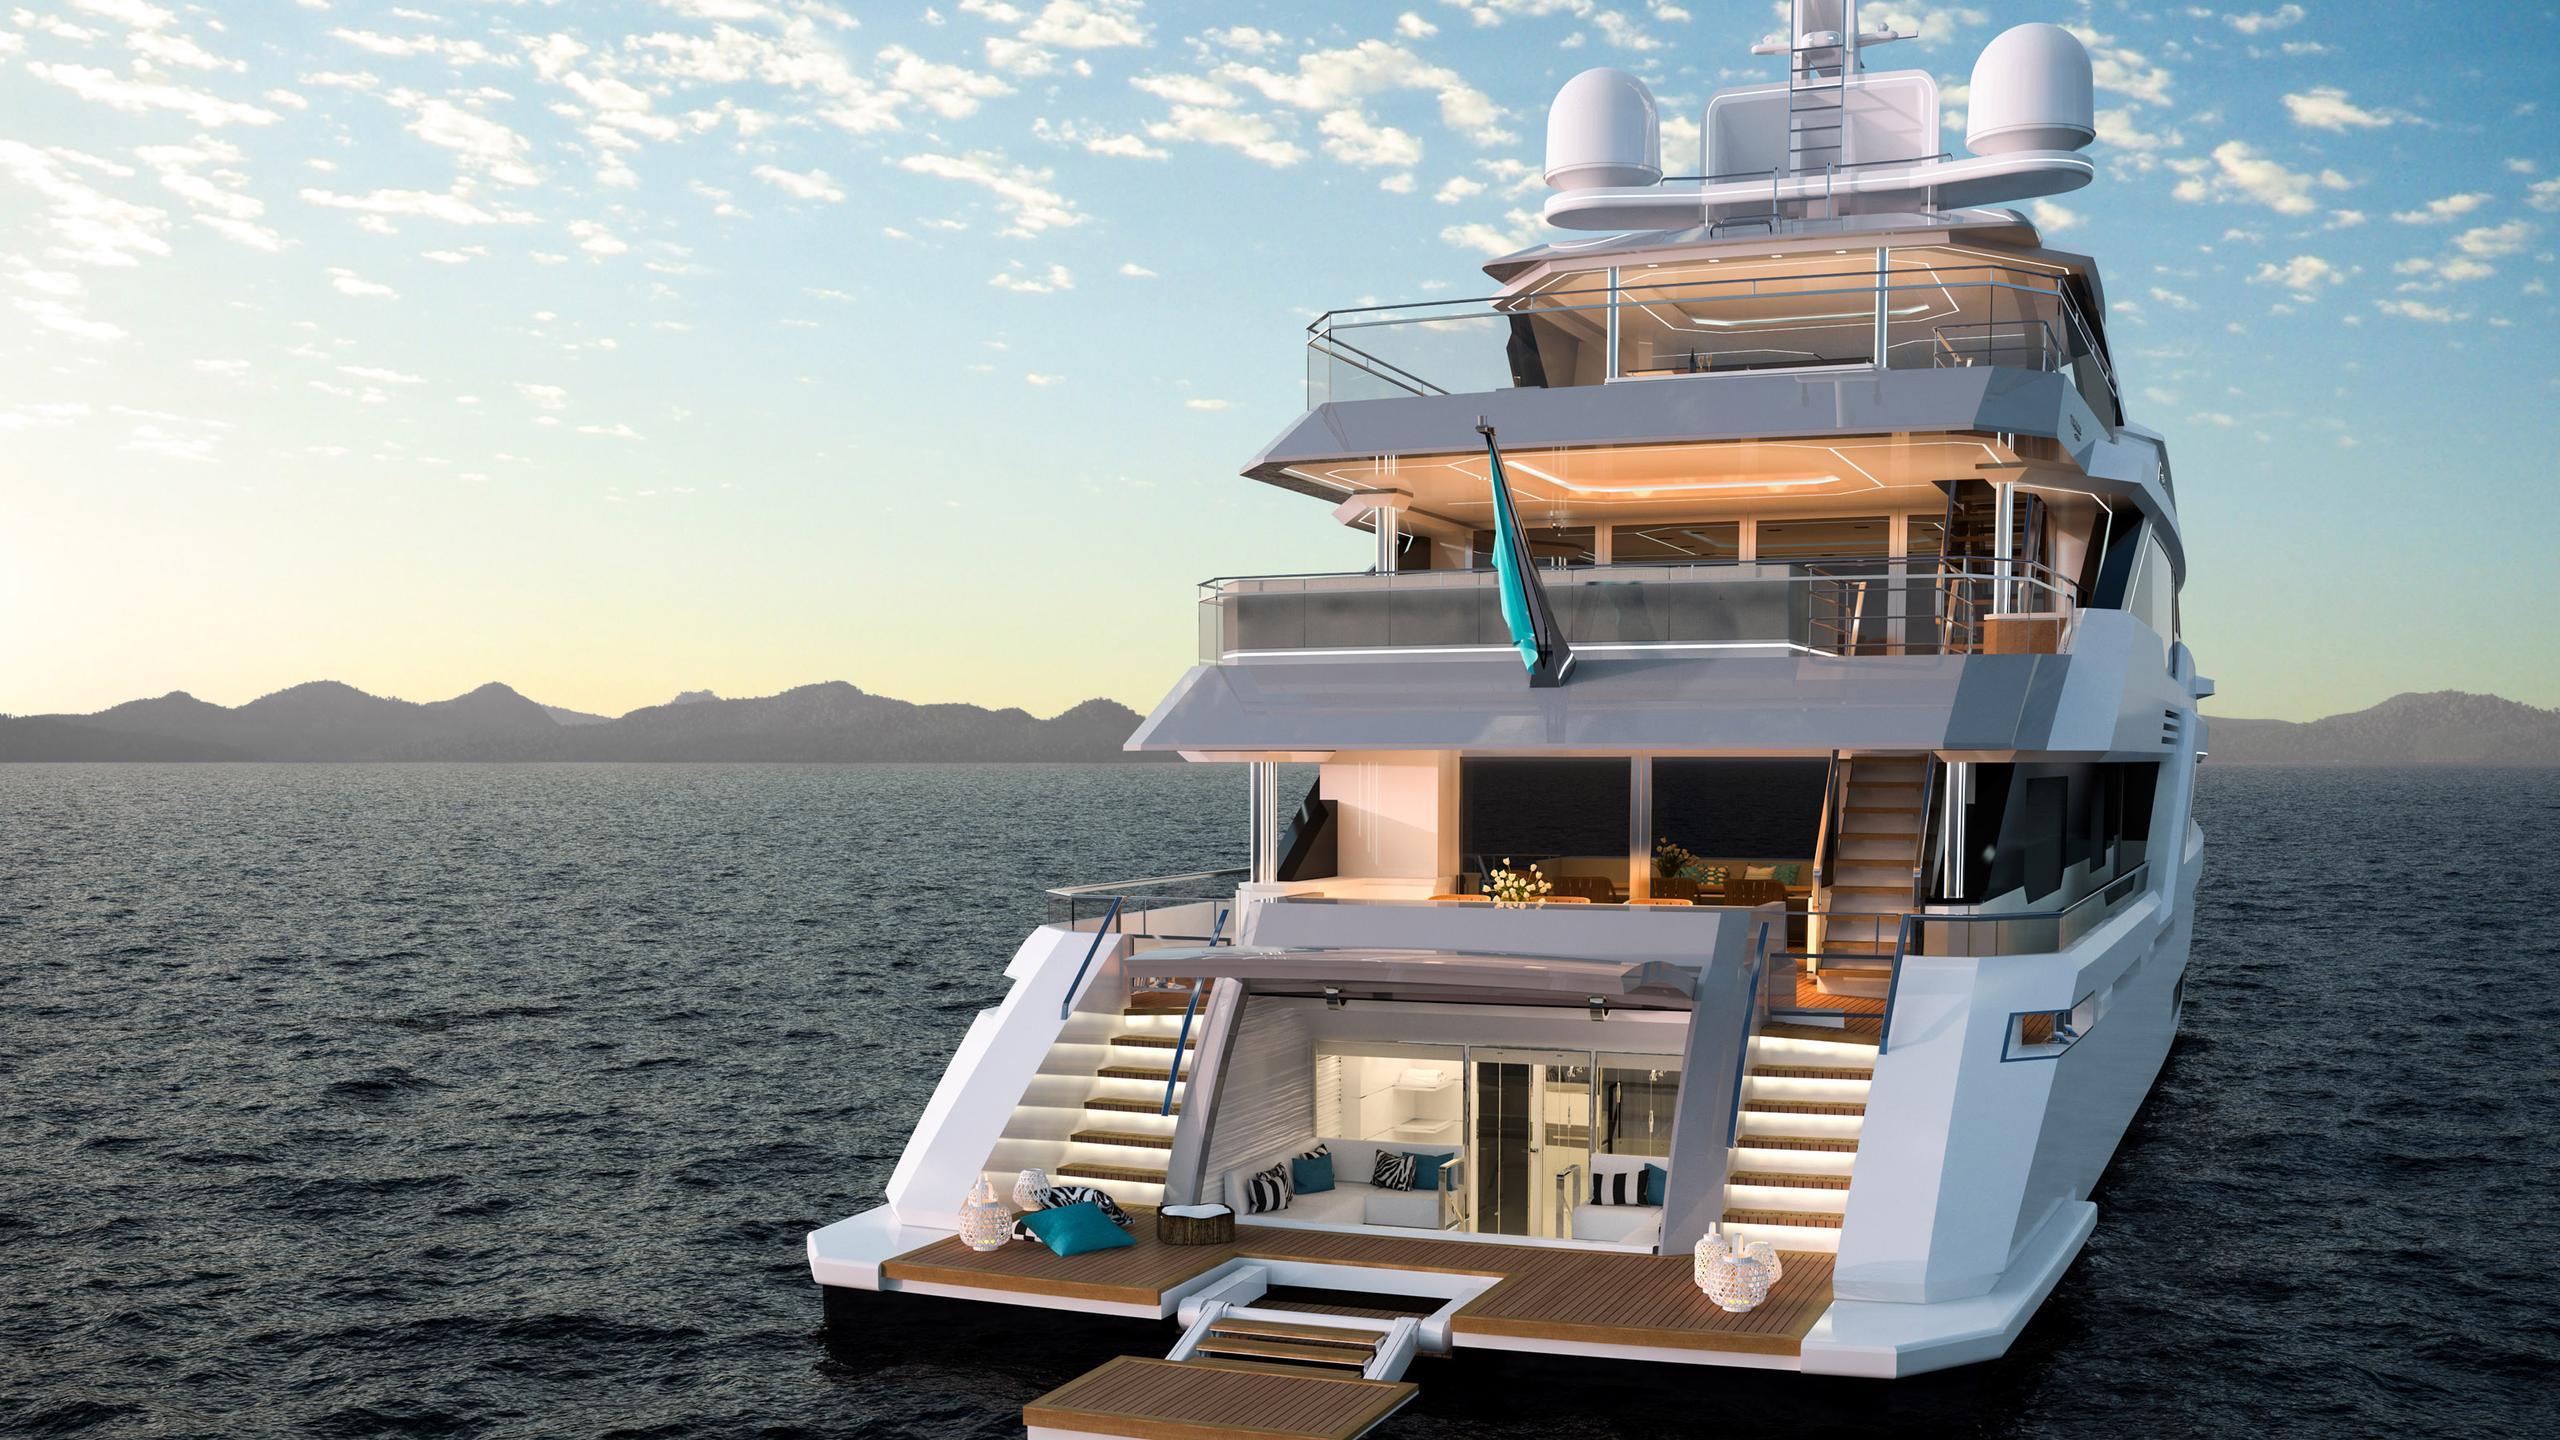 tala motoryacht turquoise yachts 53m 2020 rendering stern